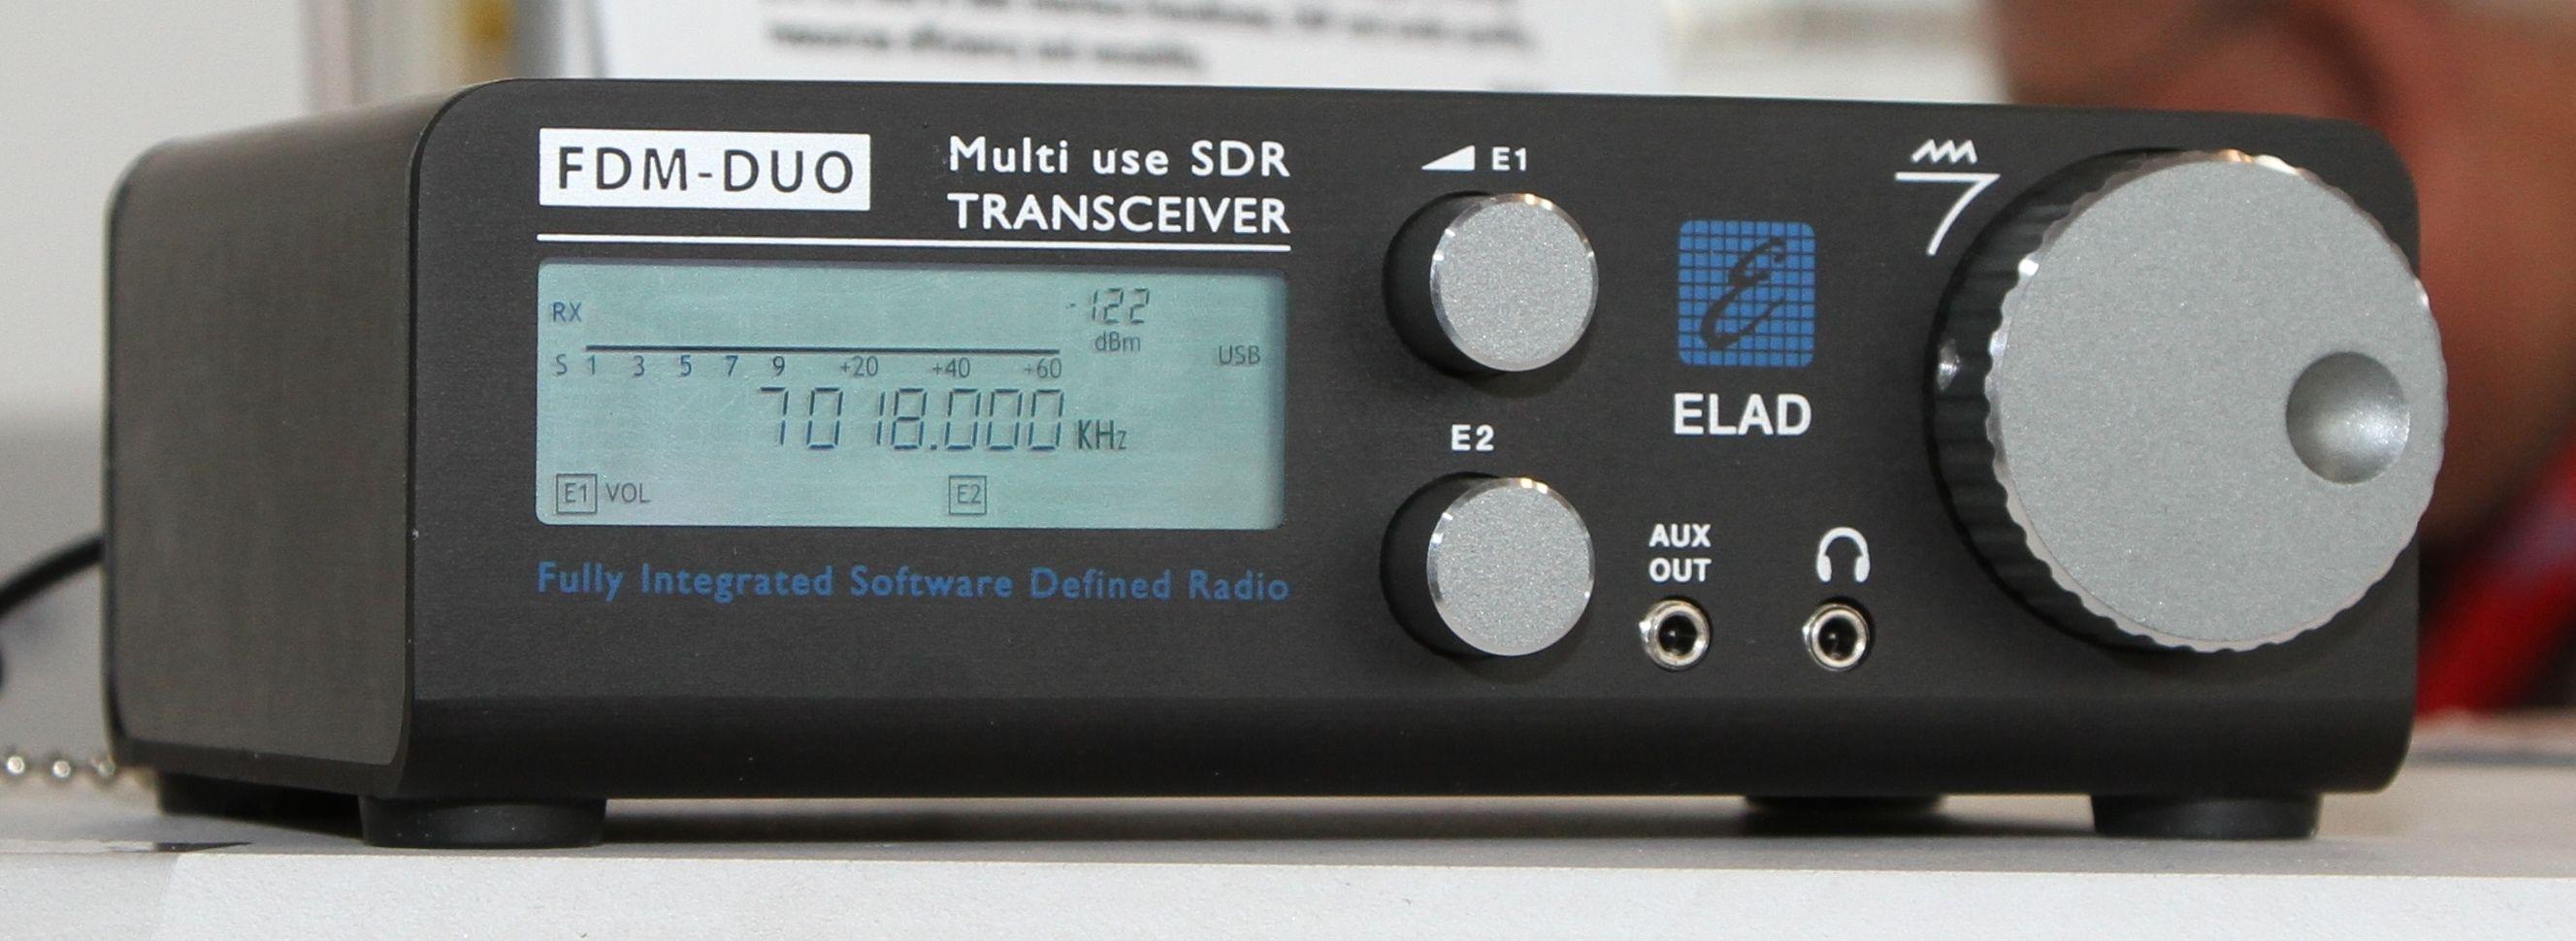 FDM DUO SDR Transceiver (2655×970) | SDR - Software Defined